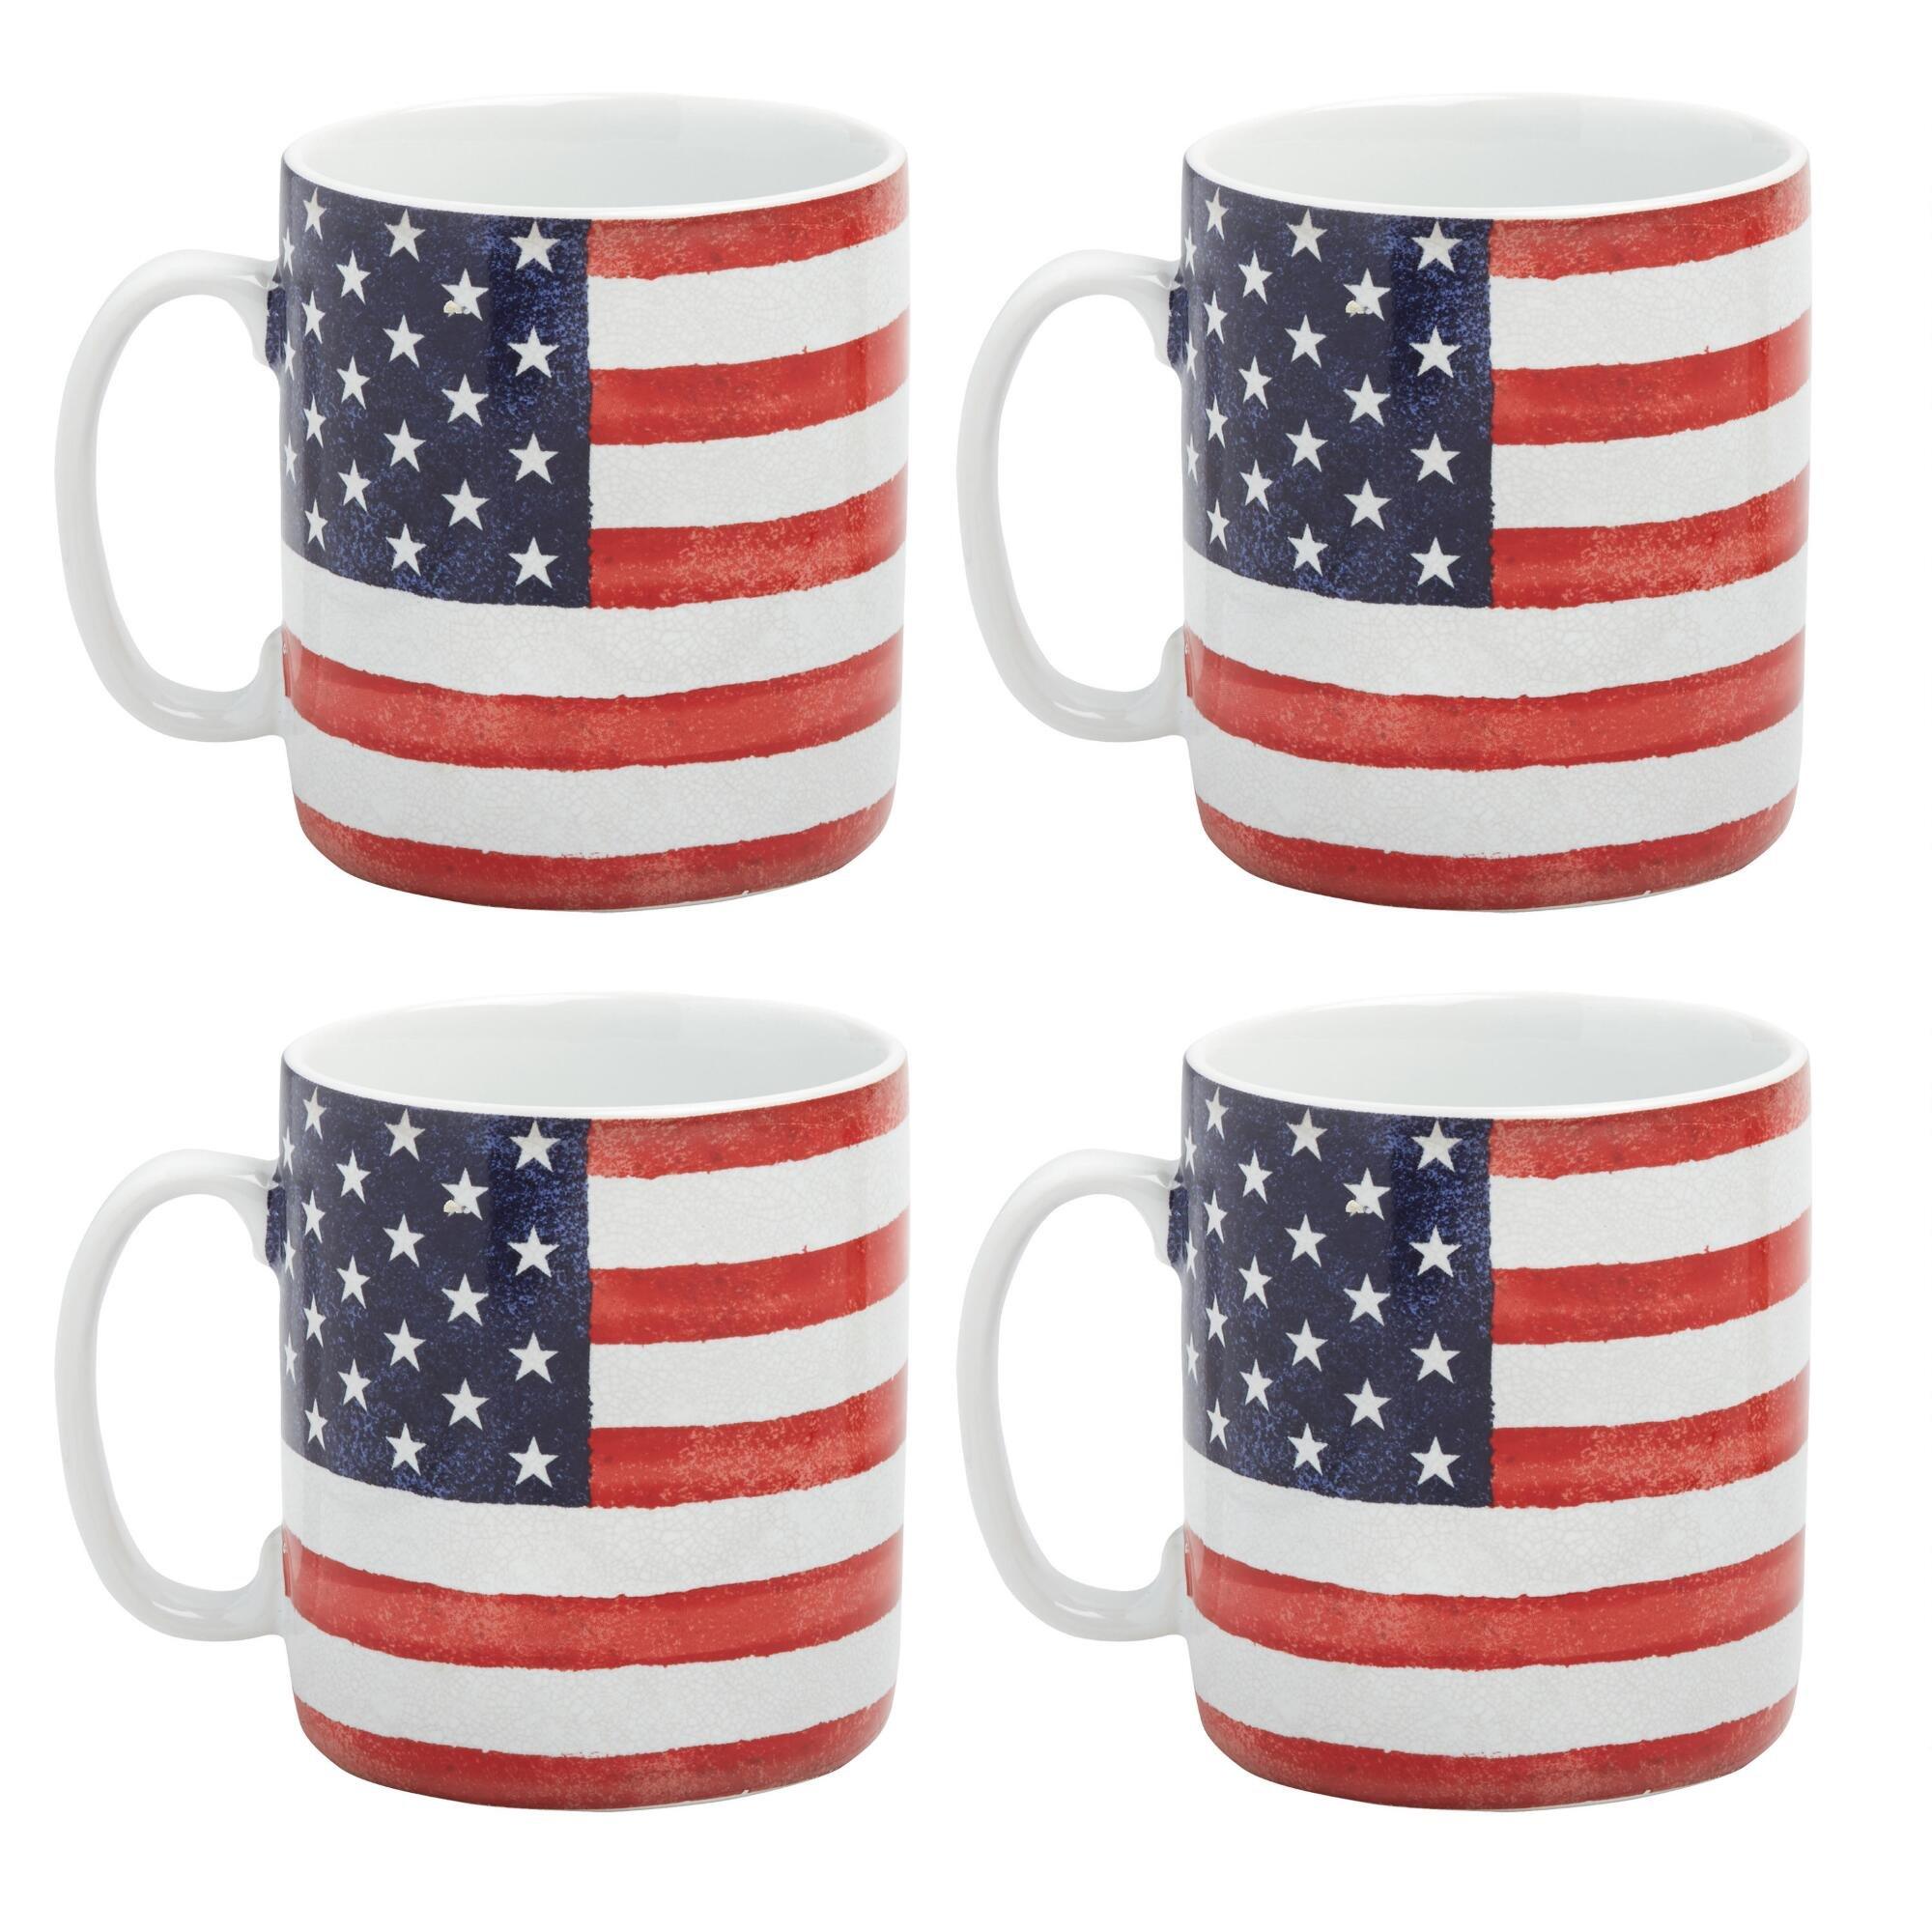 USA Old Glory Jumbo (24 oz.) Mugs, Set of 4 by Port Townsand